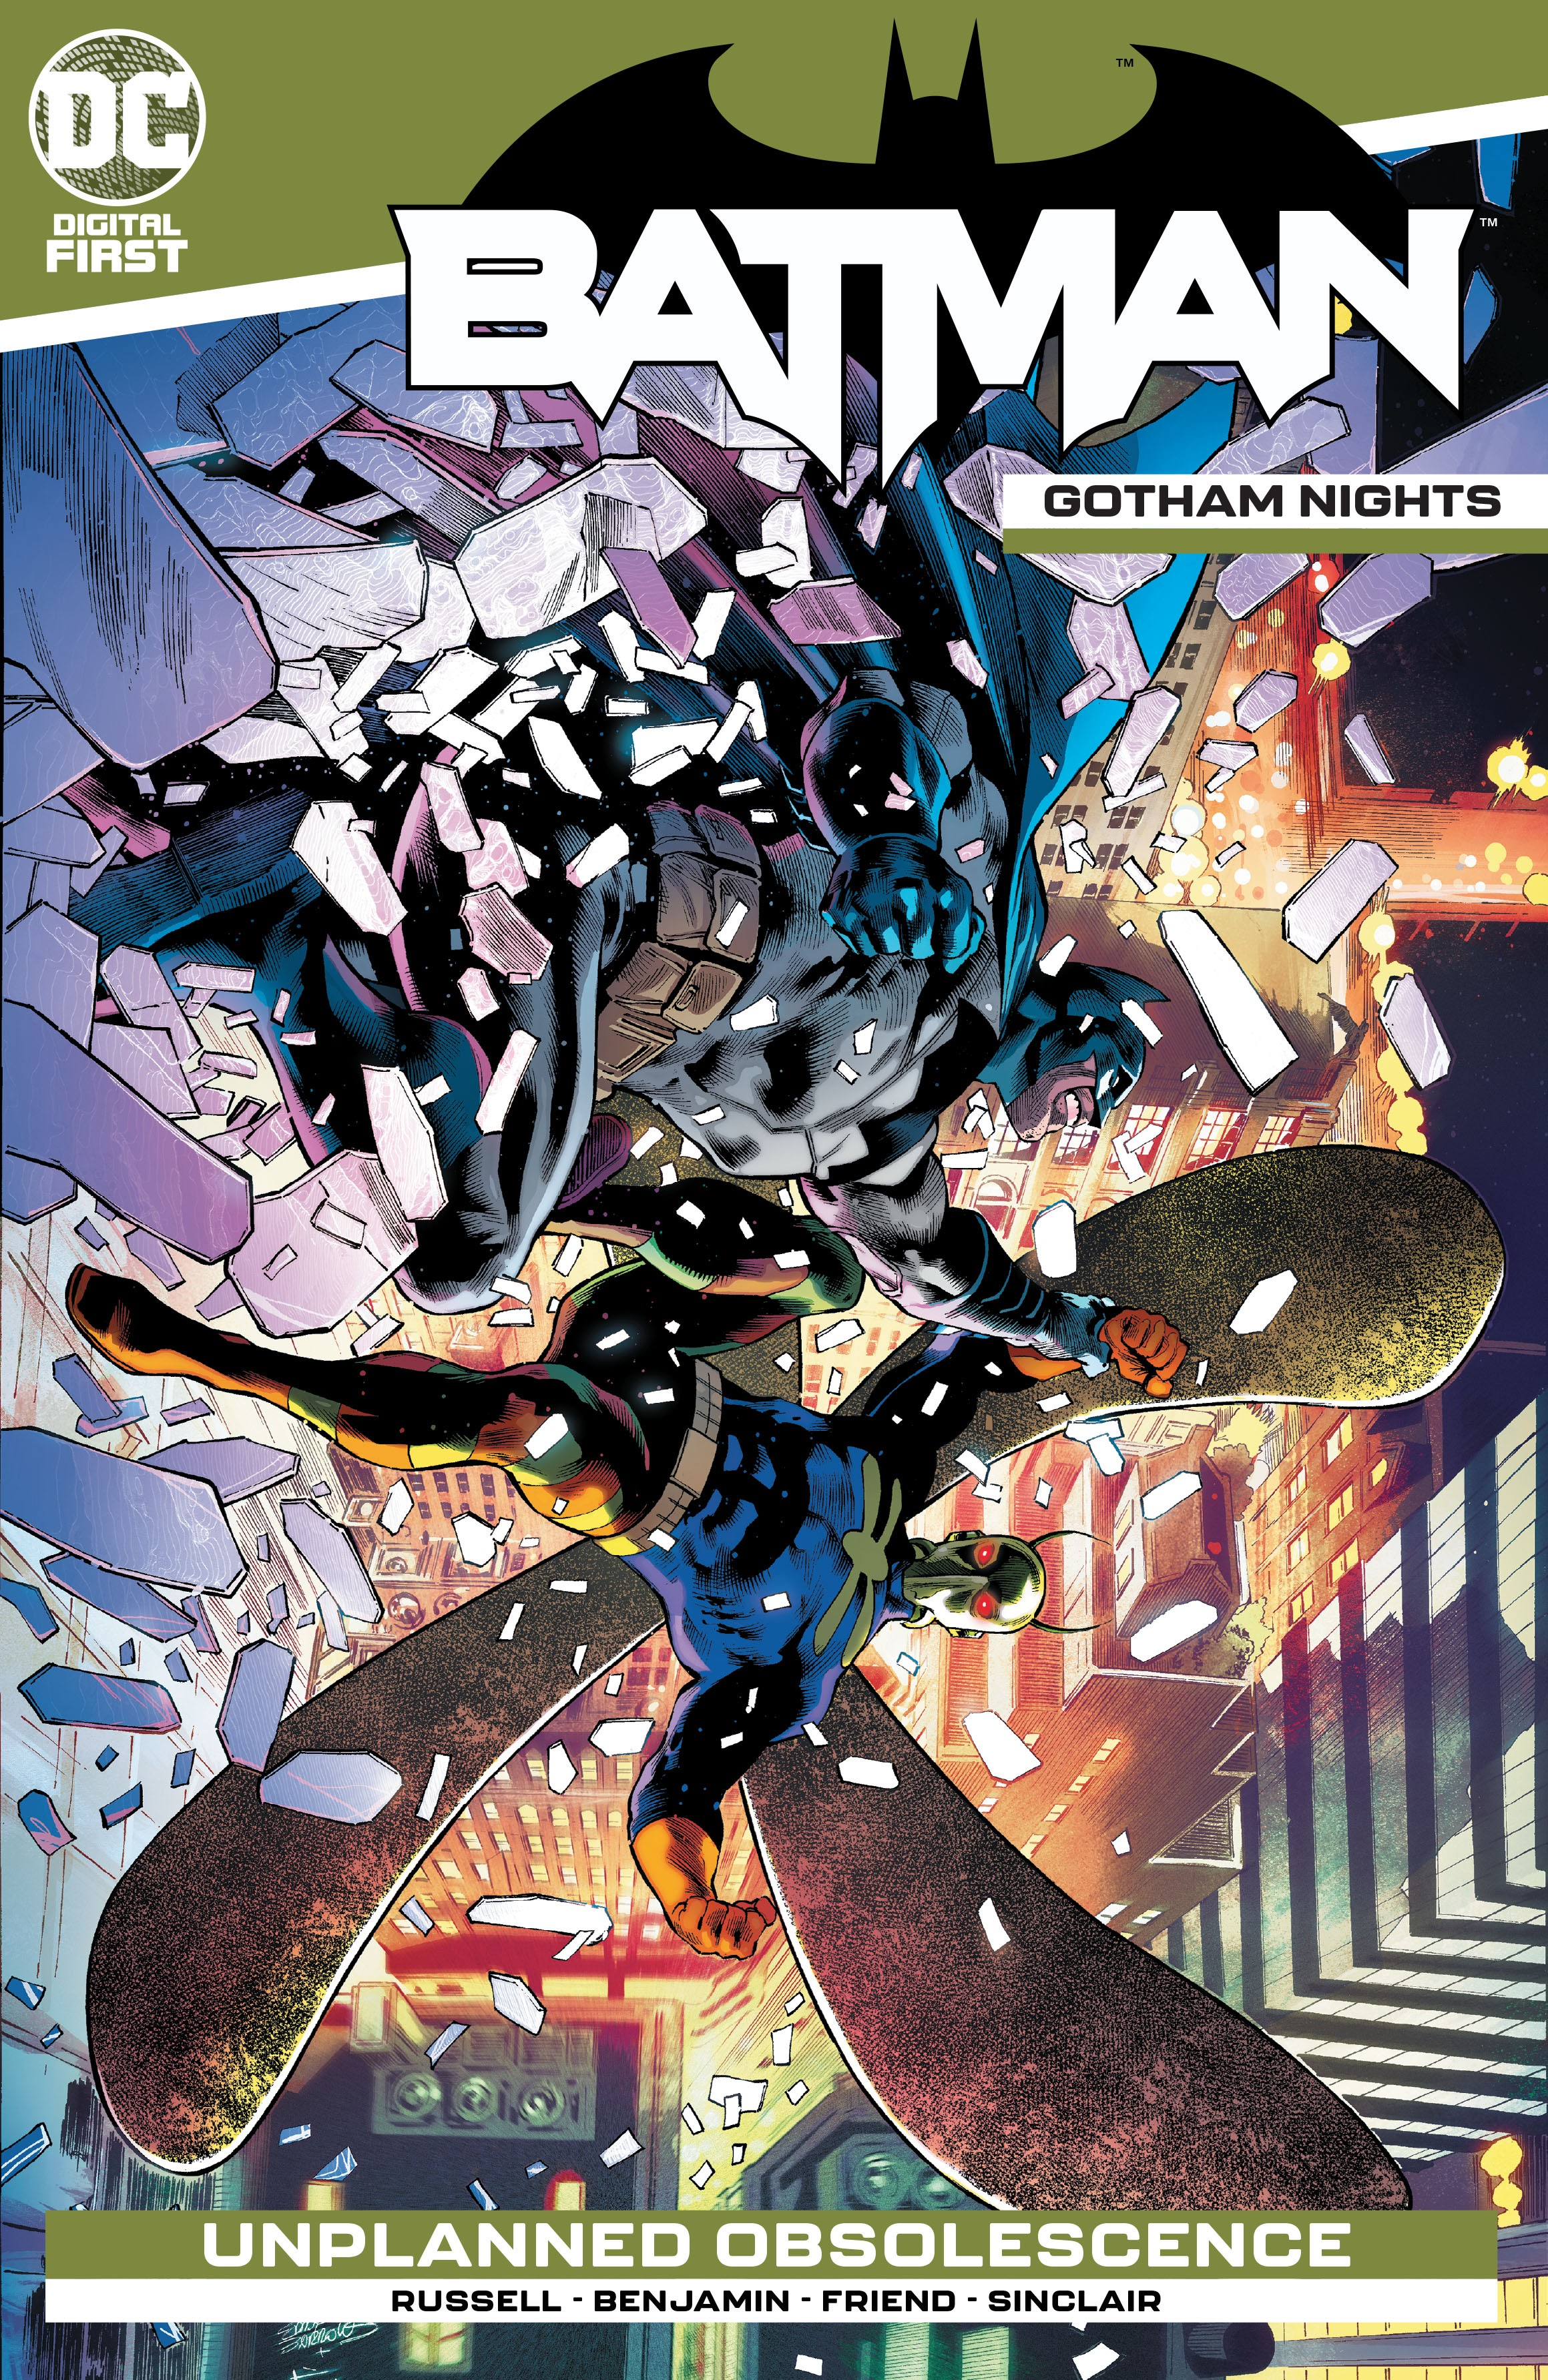 Batman: Gotham Nights Vol 1 7 (Digital)